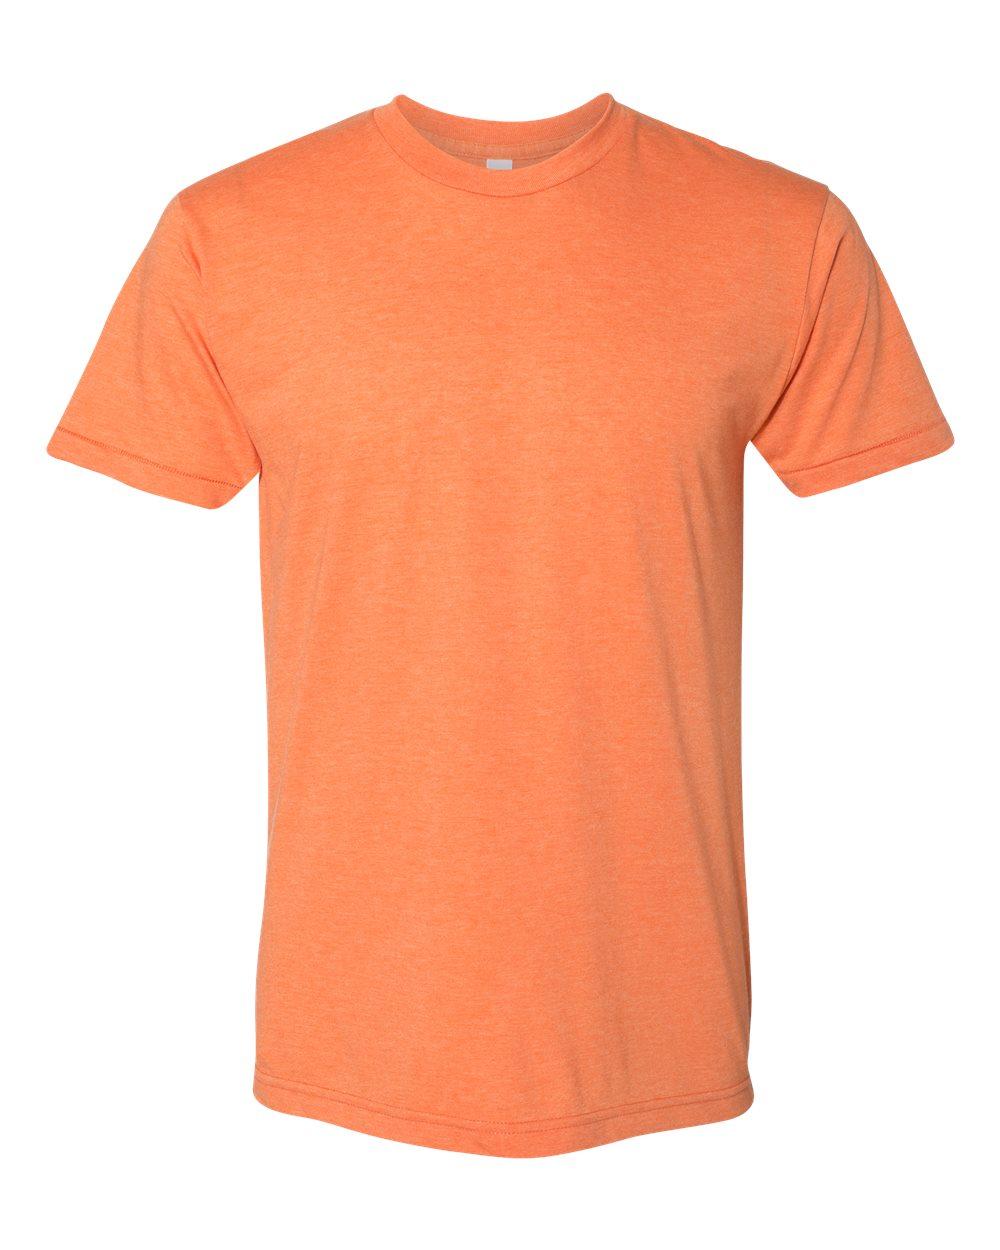 American-Apparel-Mens-Slim-Fit-50-50-Cotton-T-Shirt-Tee-BB401W-up-to-2XL thumbnail 33